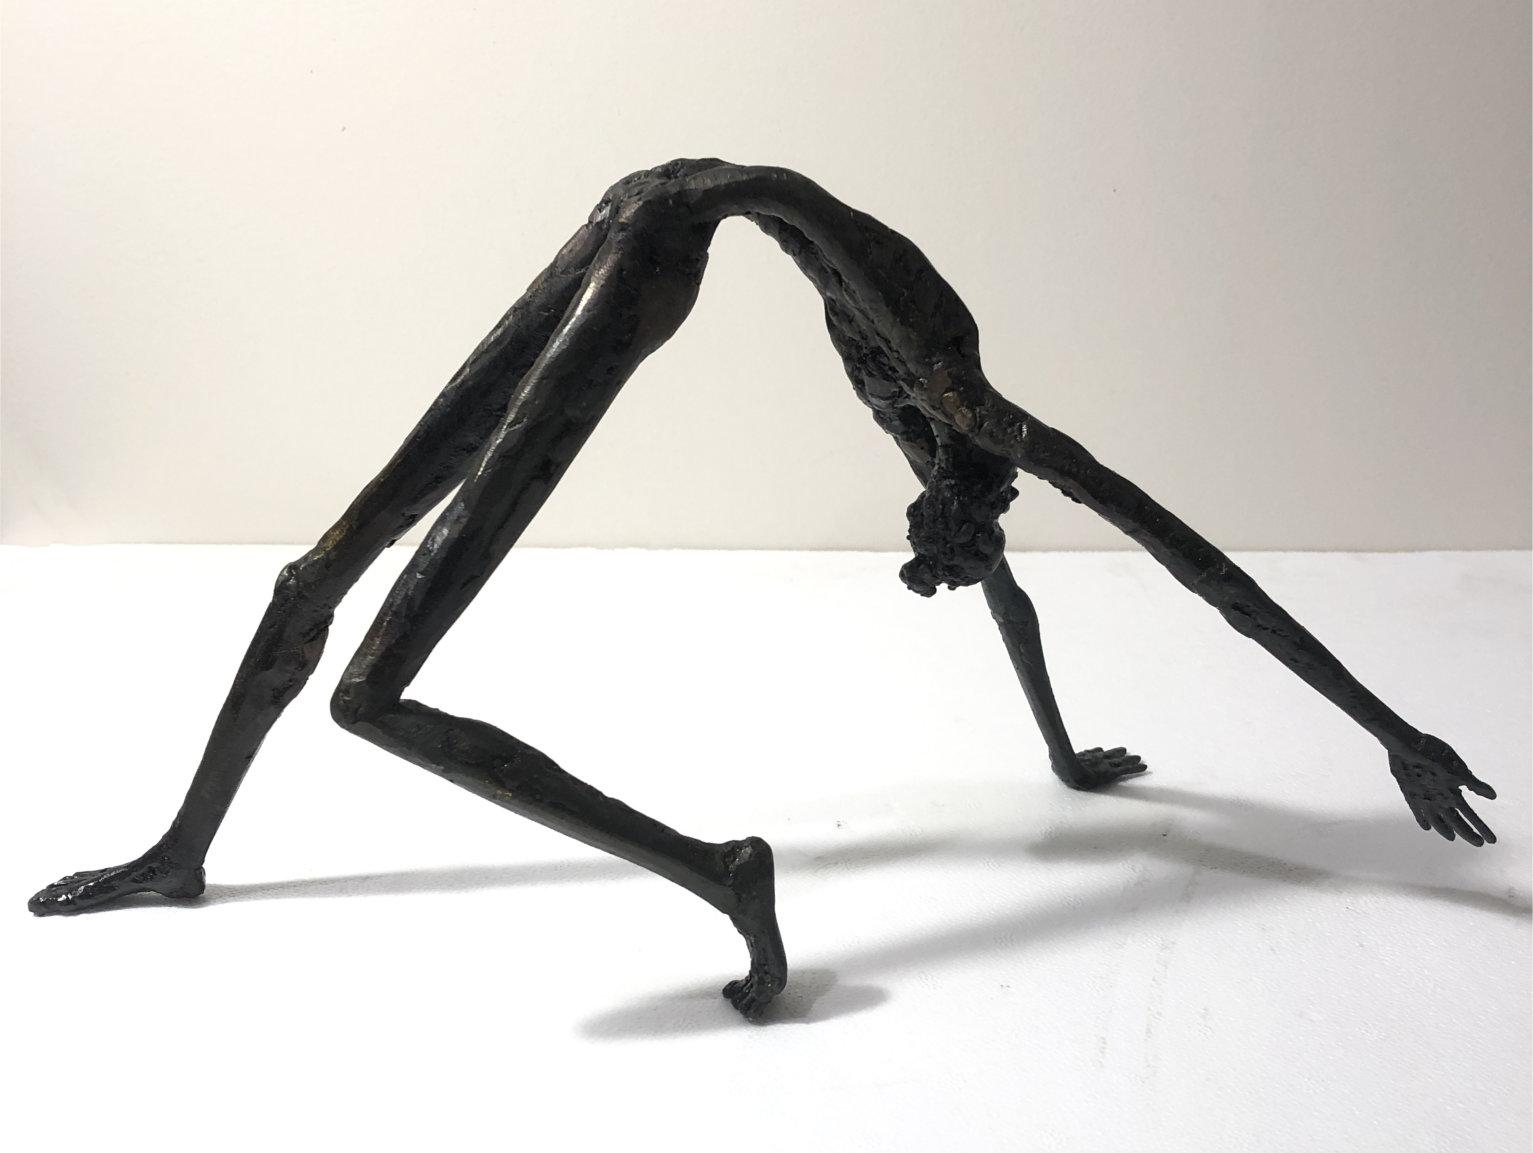 Steel sculpture by Tony O'Keefe. New Zealand artist.